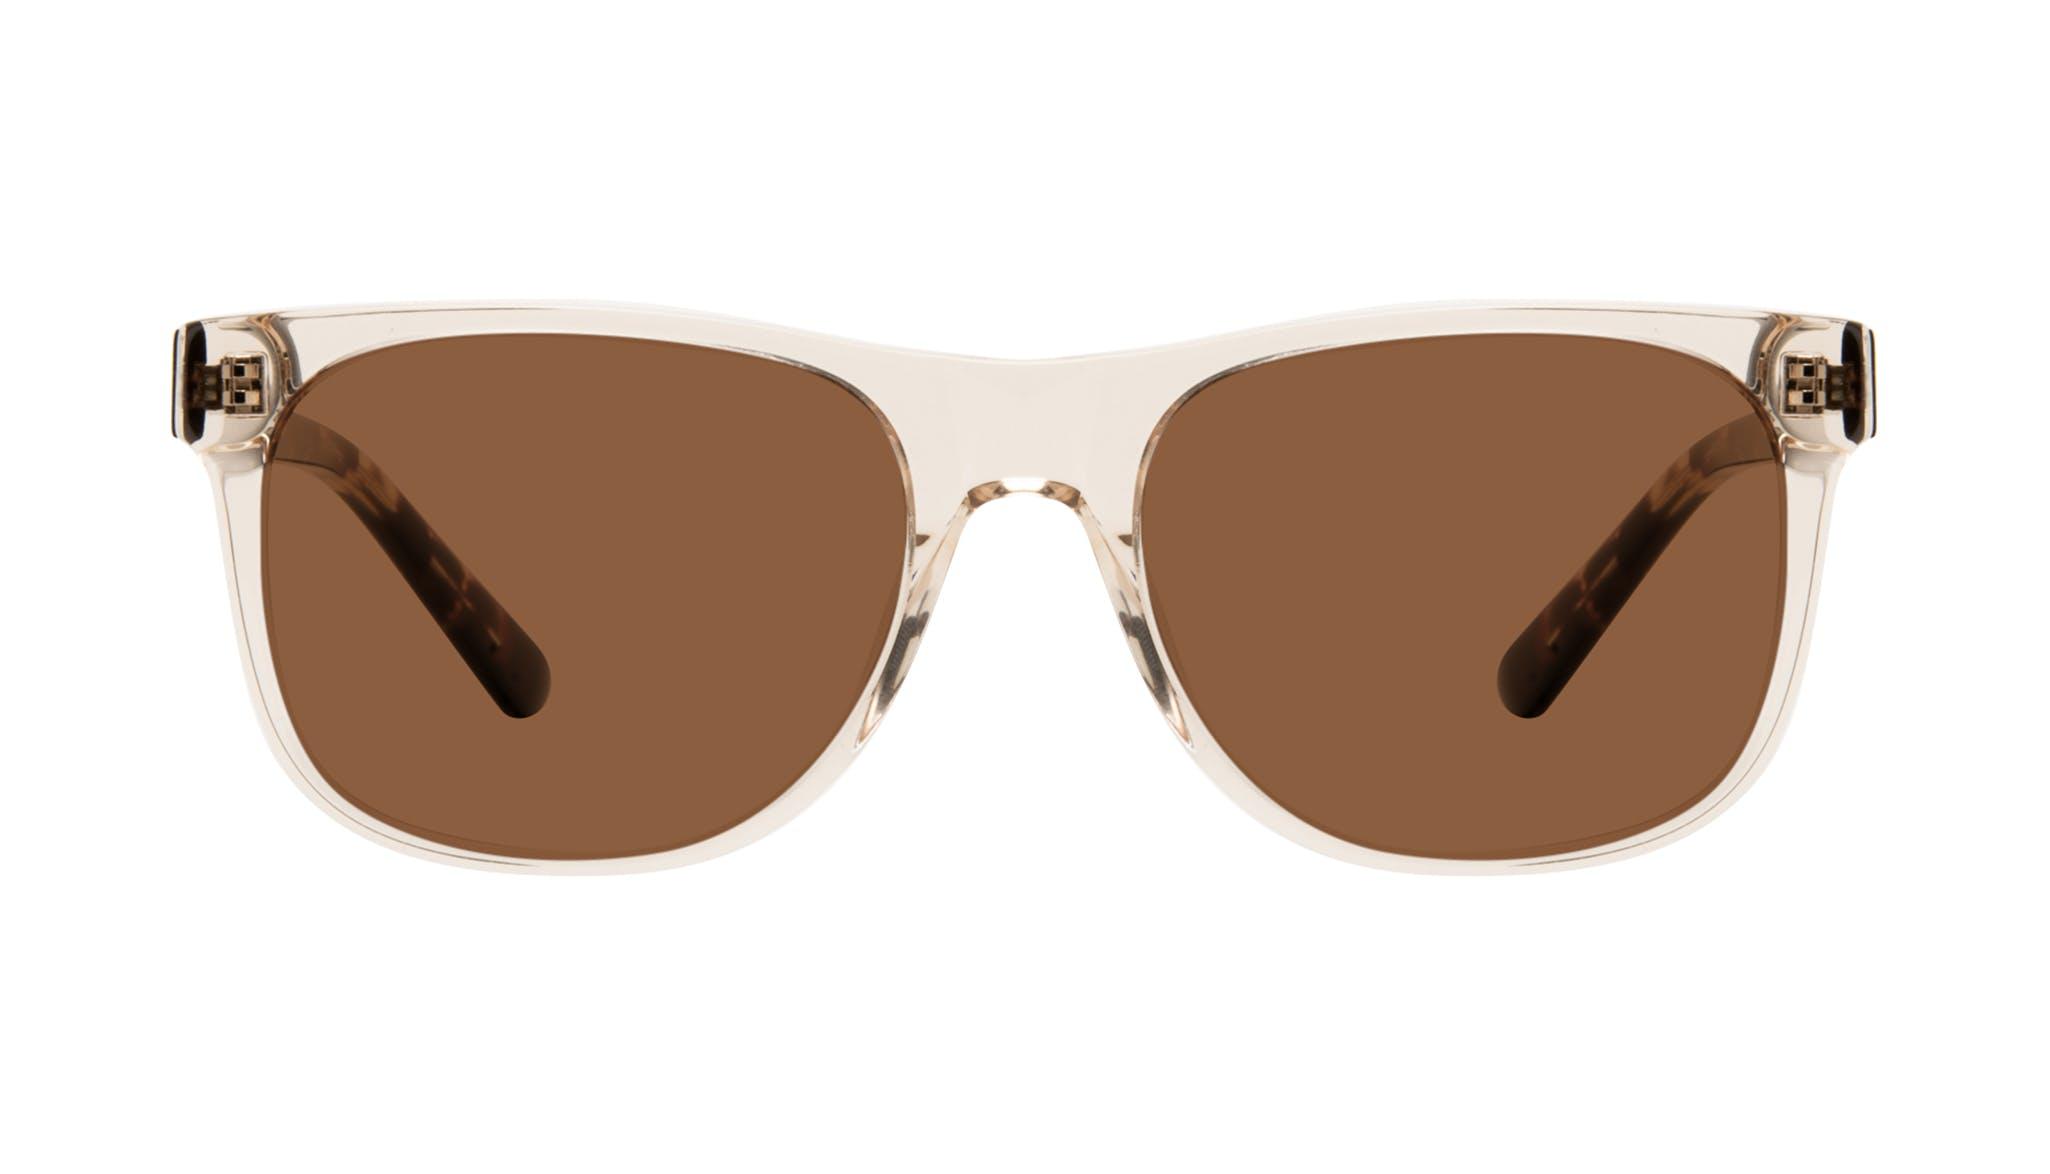 Affordable Fashion Glasses Square Sunglasses Men Make Golden Tort Front